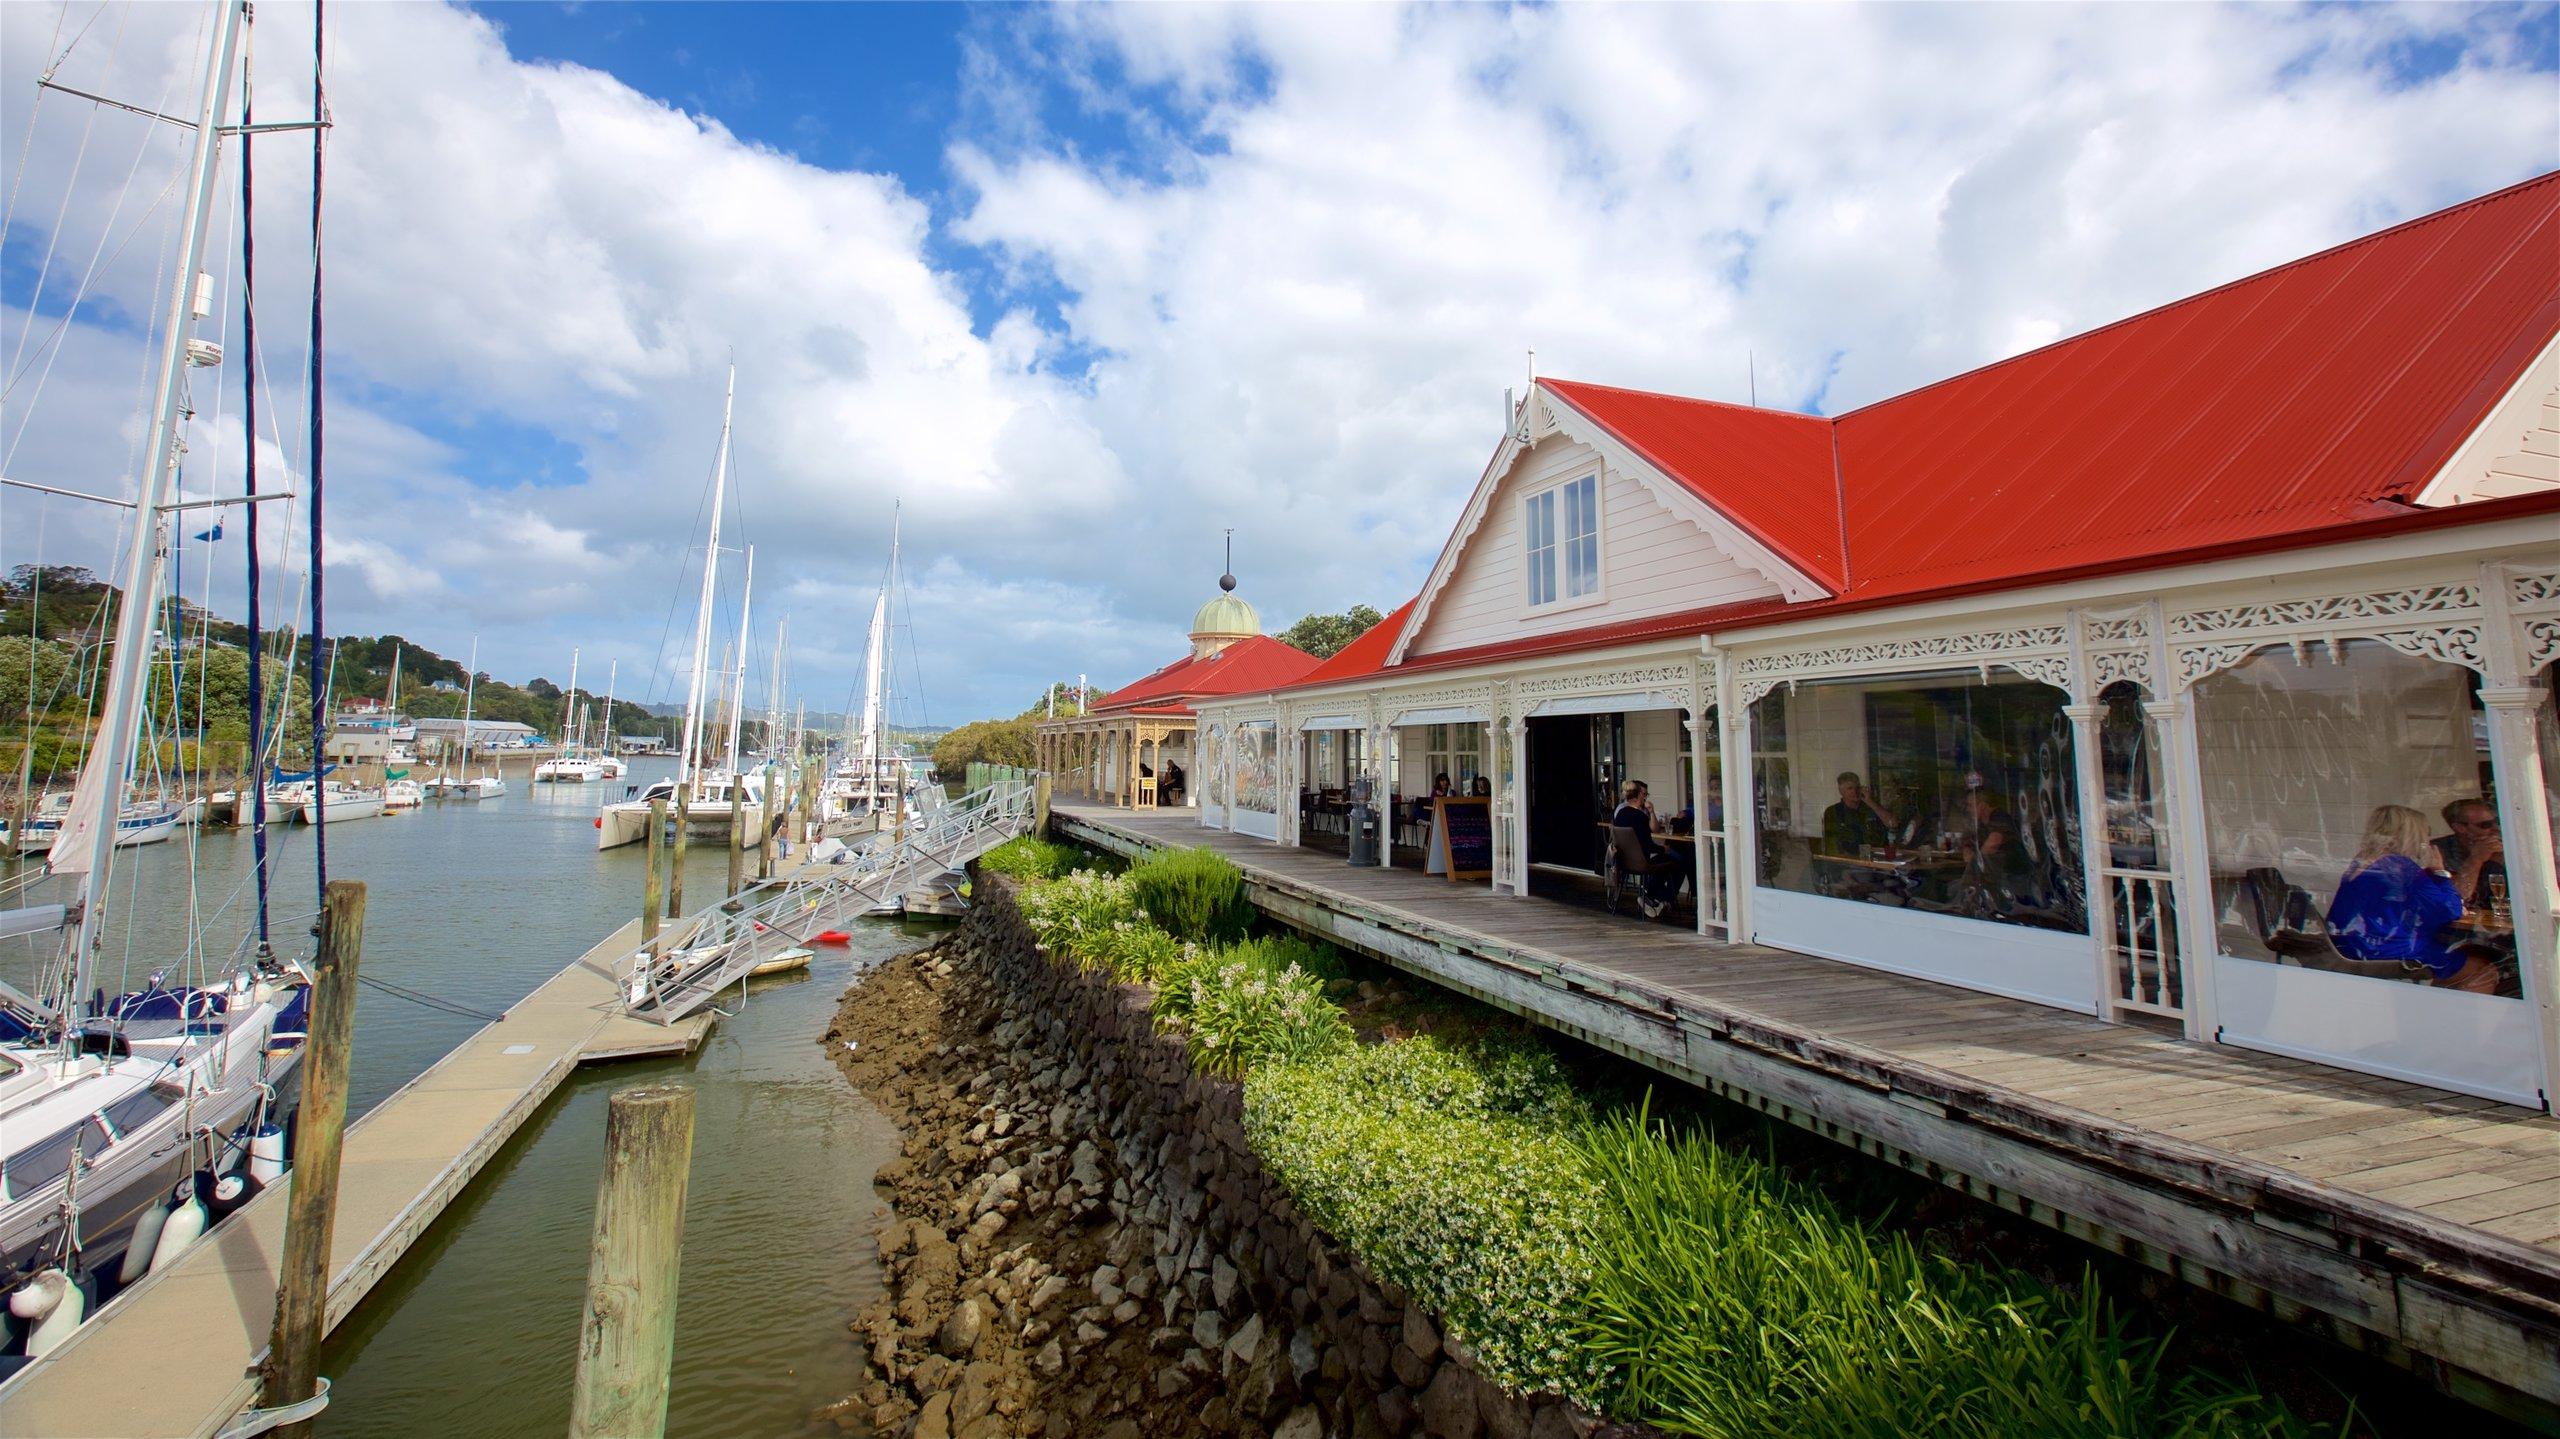 Whangarei, Northland, New Zealand